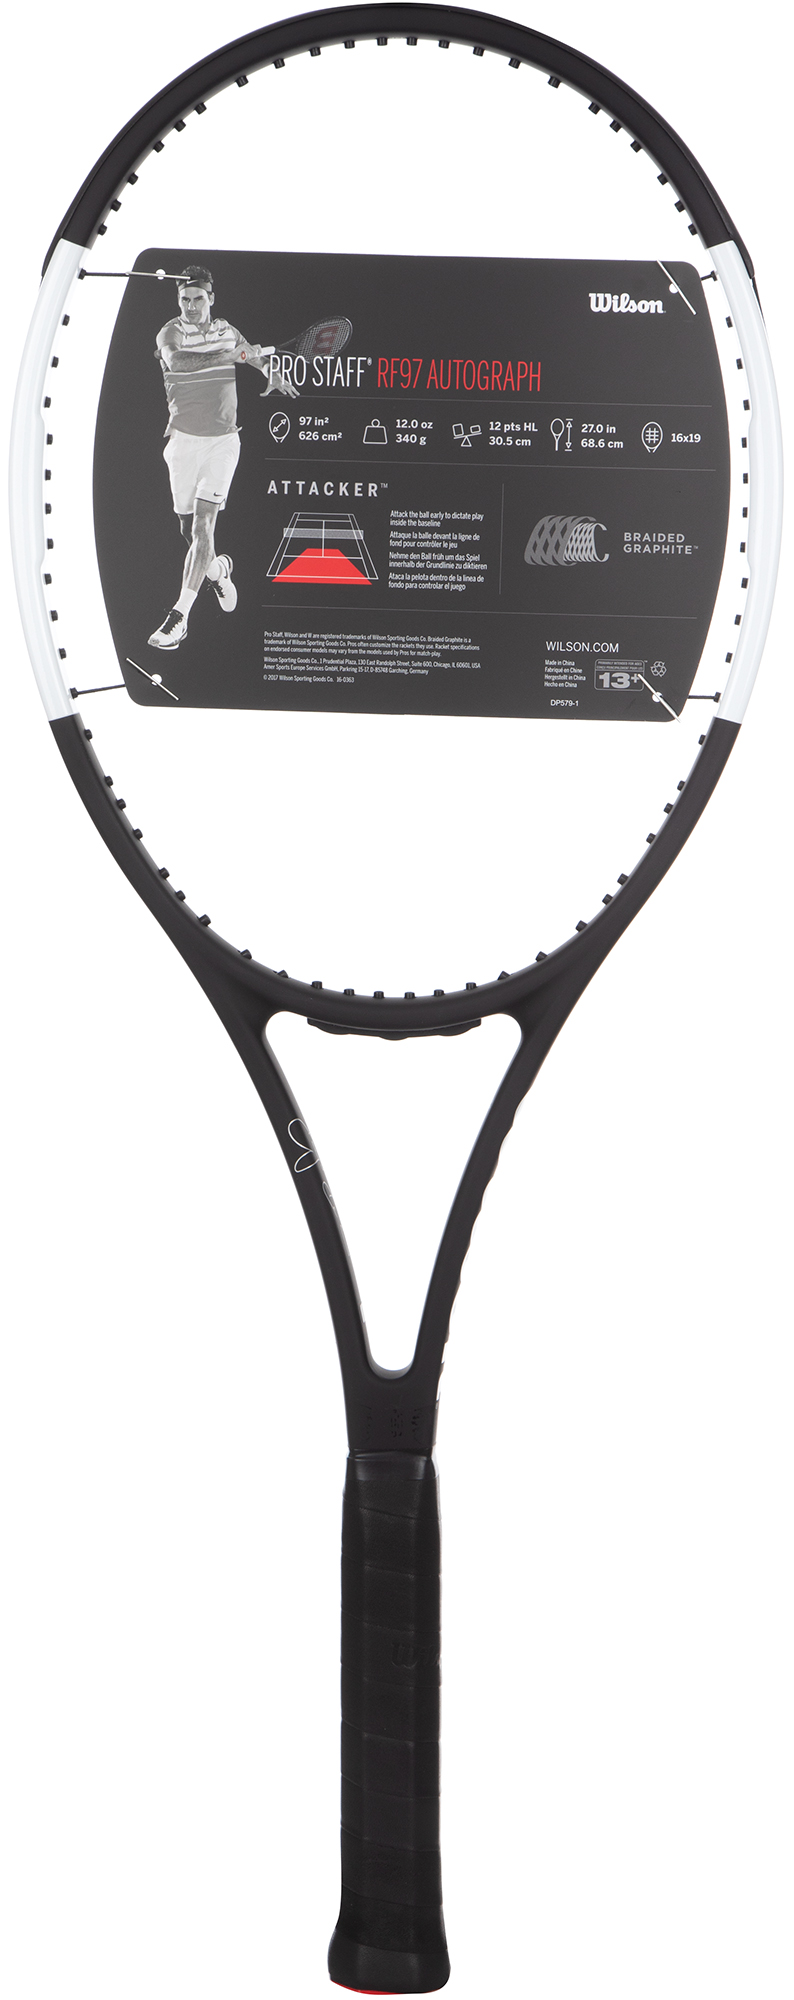 Wilson Ракетка для большого тенниса Pro Staff RF97 Auto